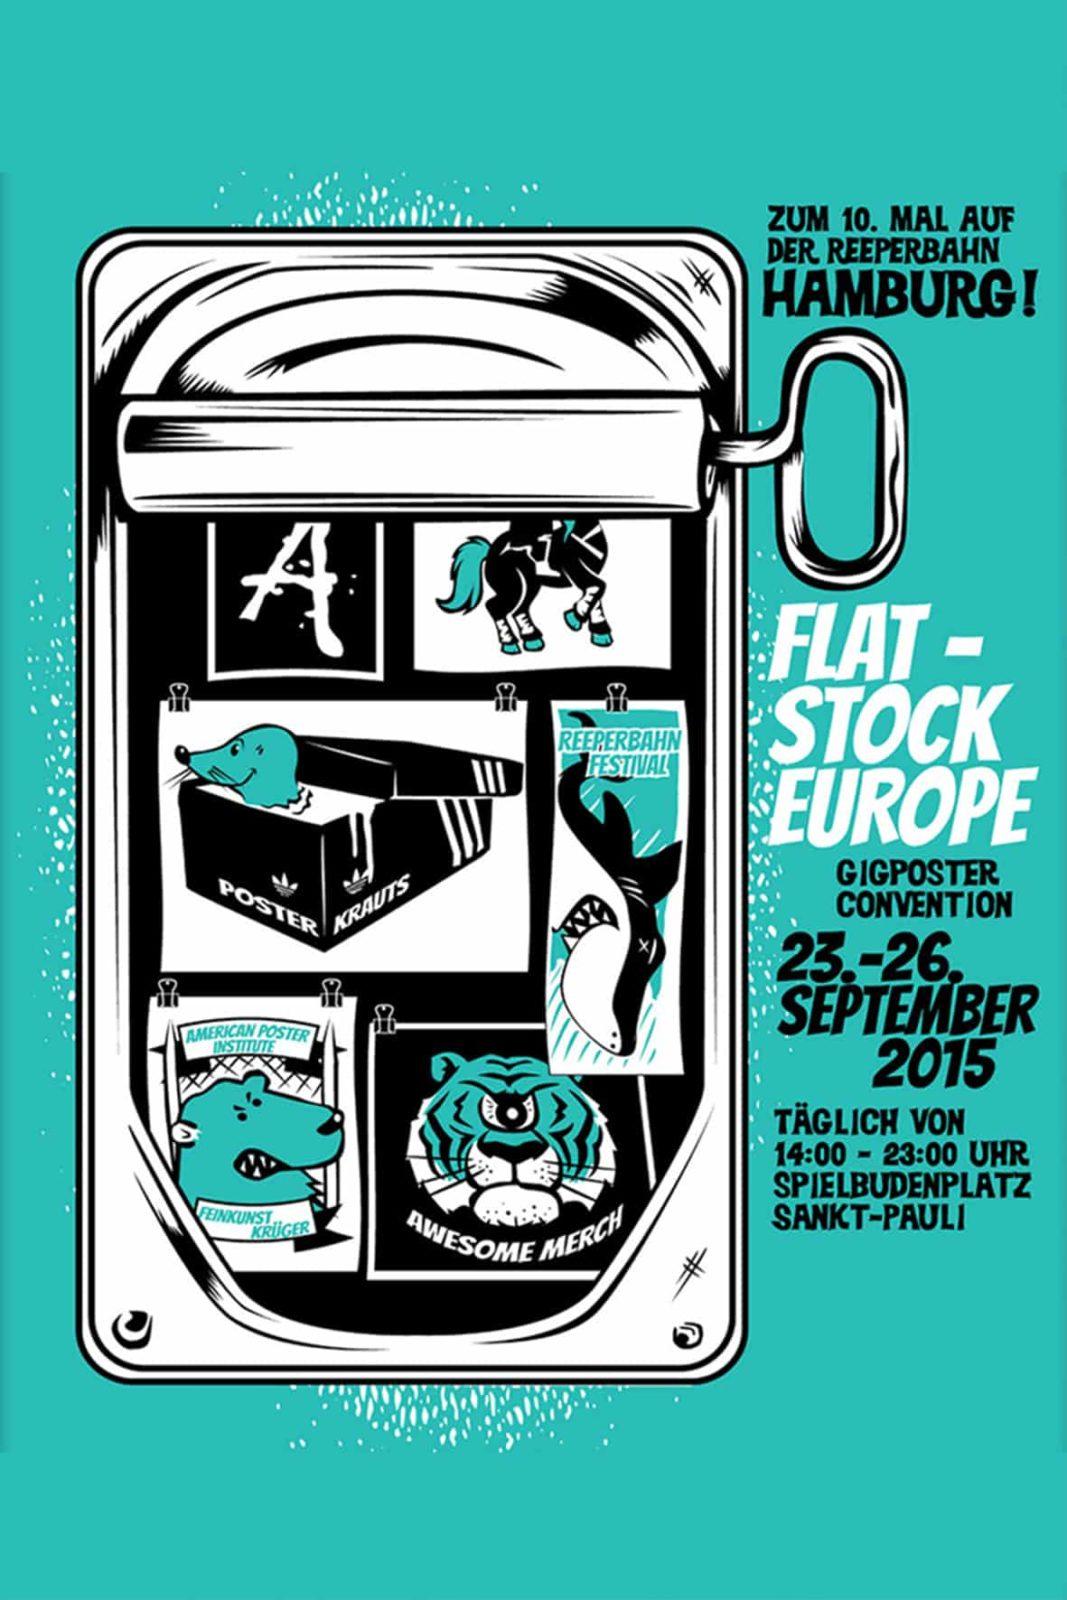 Flatstock Europe 2015 - Gigposter